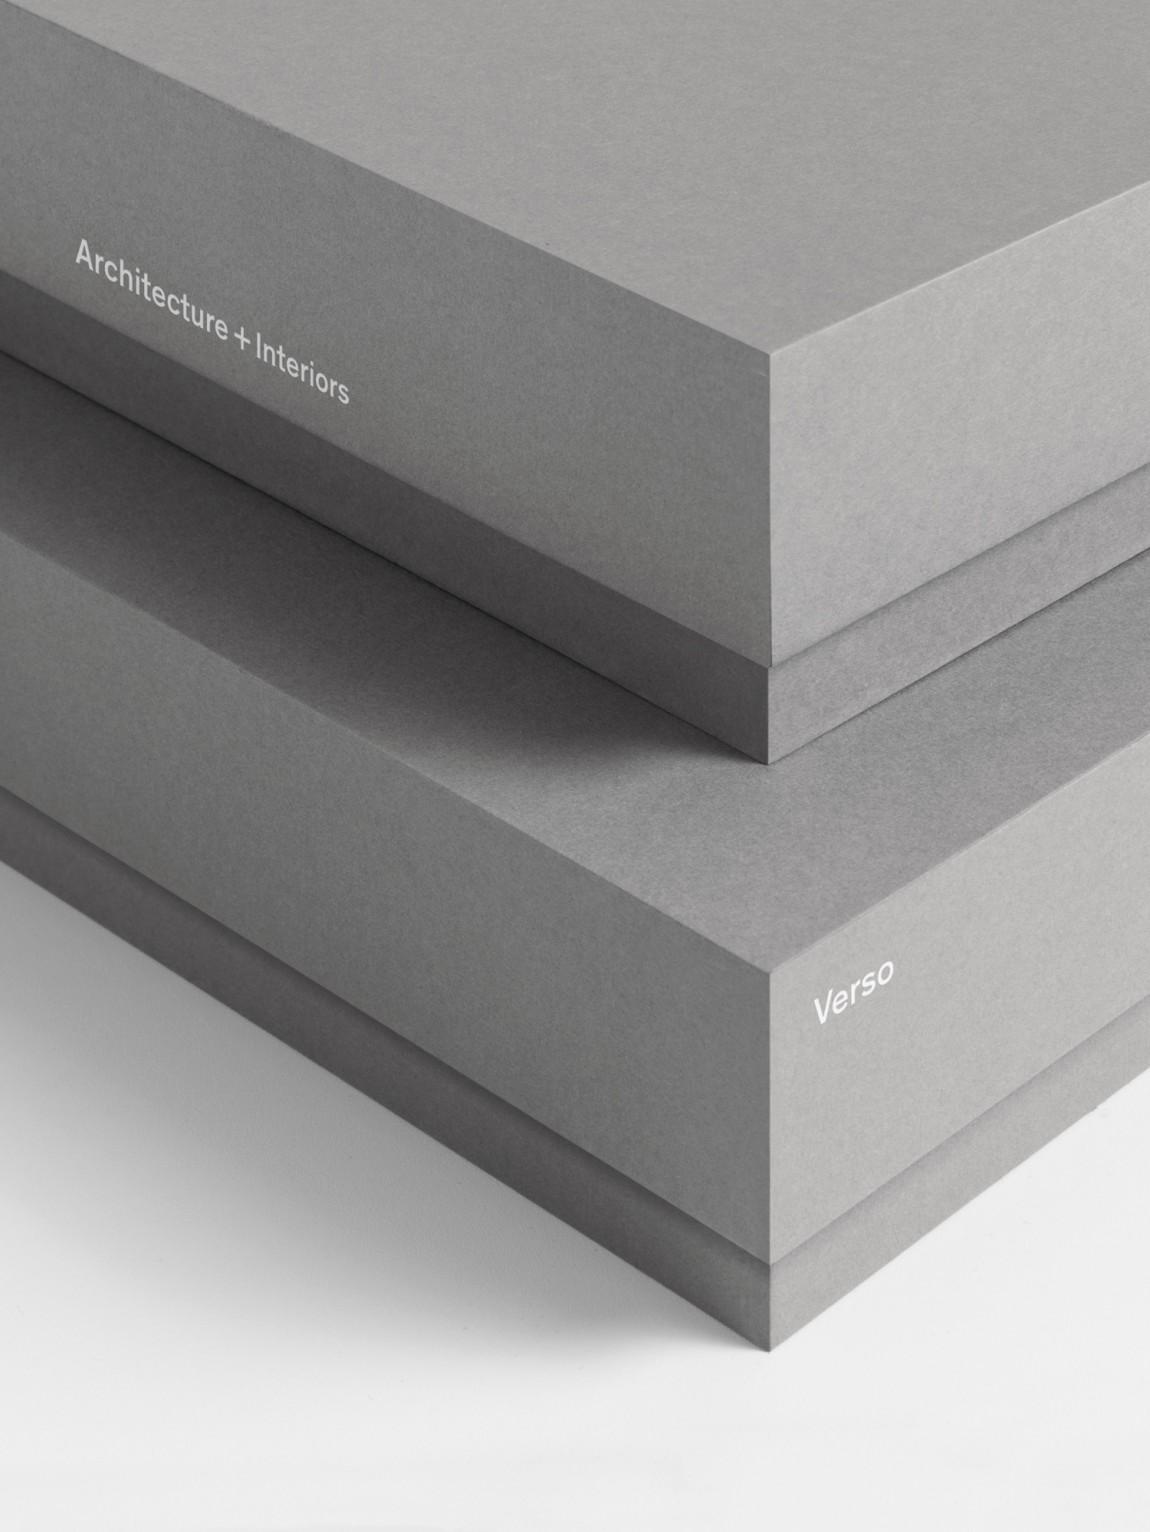 Verso建筑空间设计公司企业形象VI设计手册